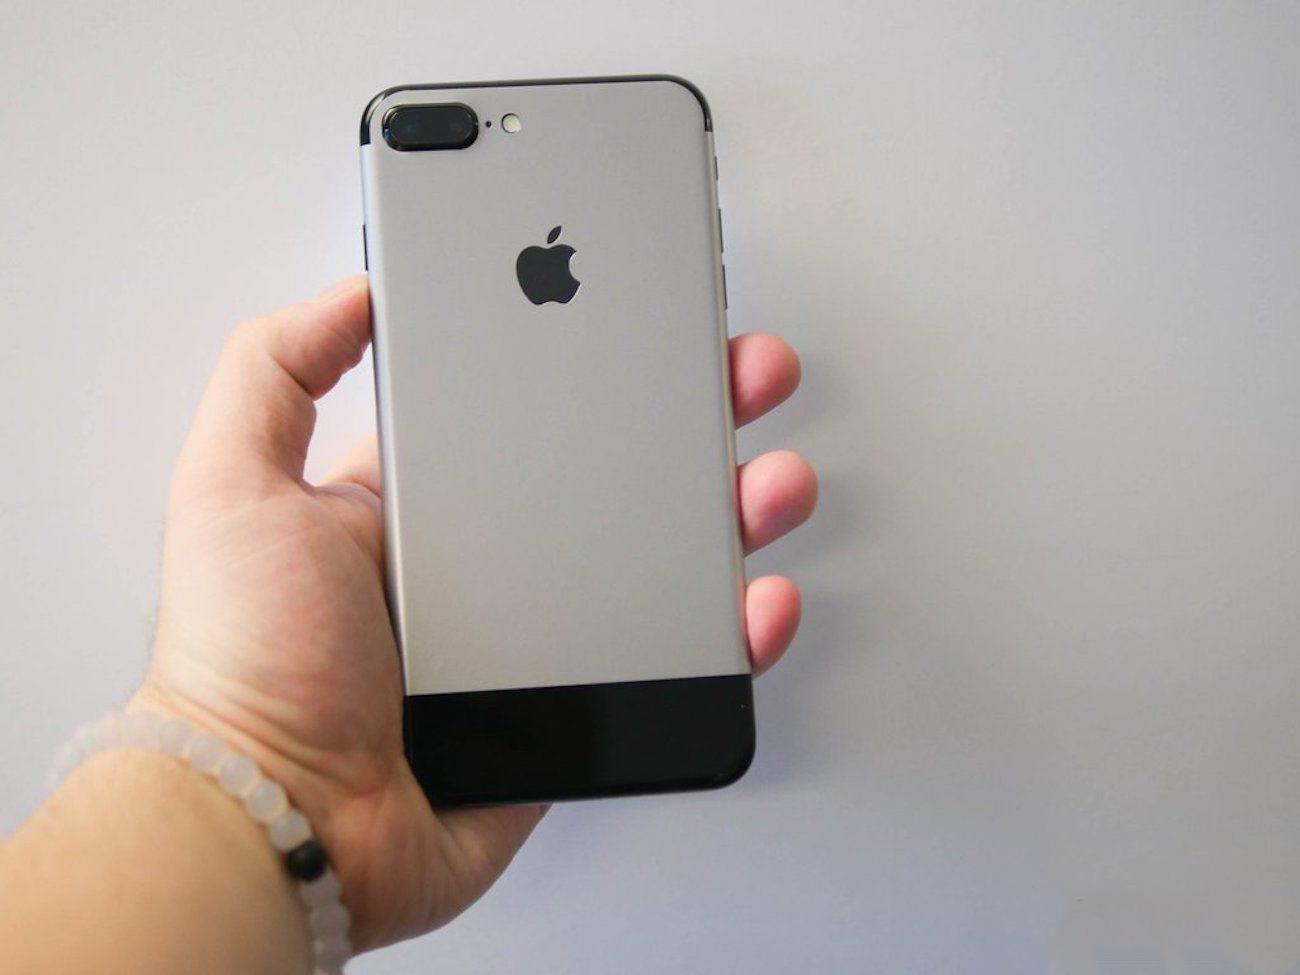 Grfxp Wrap-Around iPhone Skin